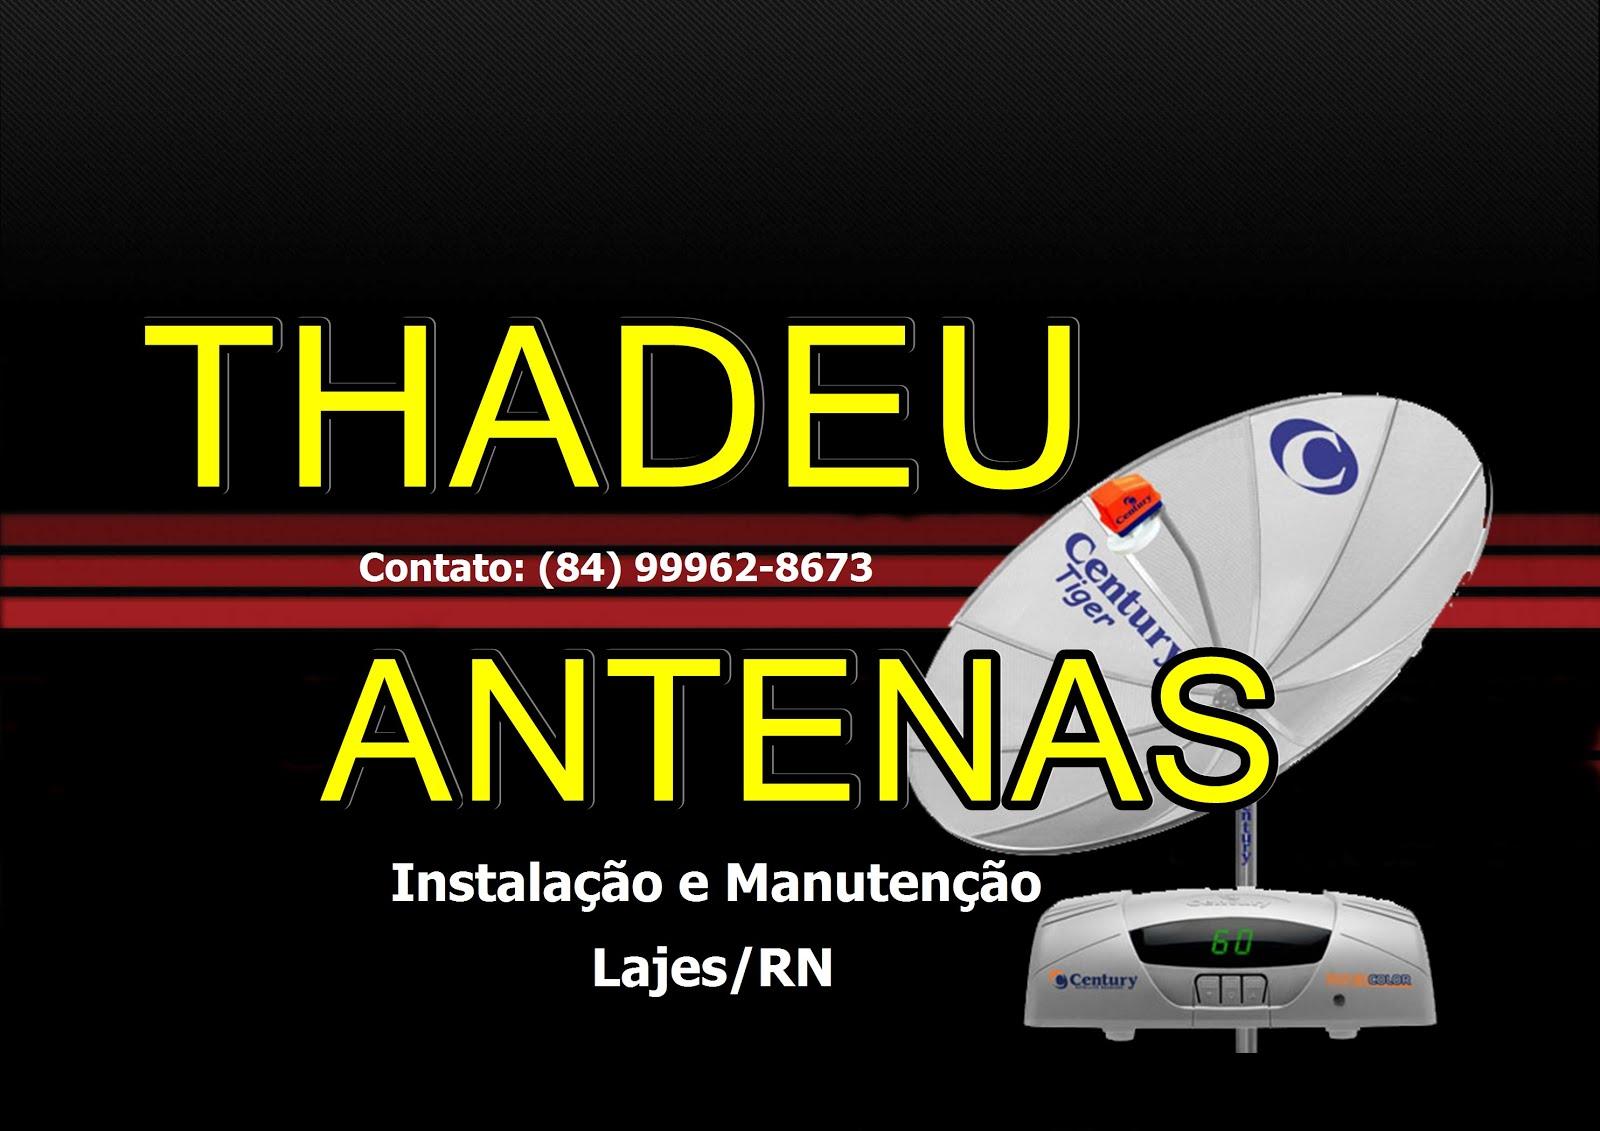 THADEU ANTENAS